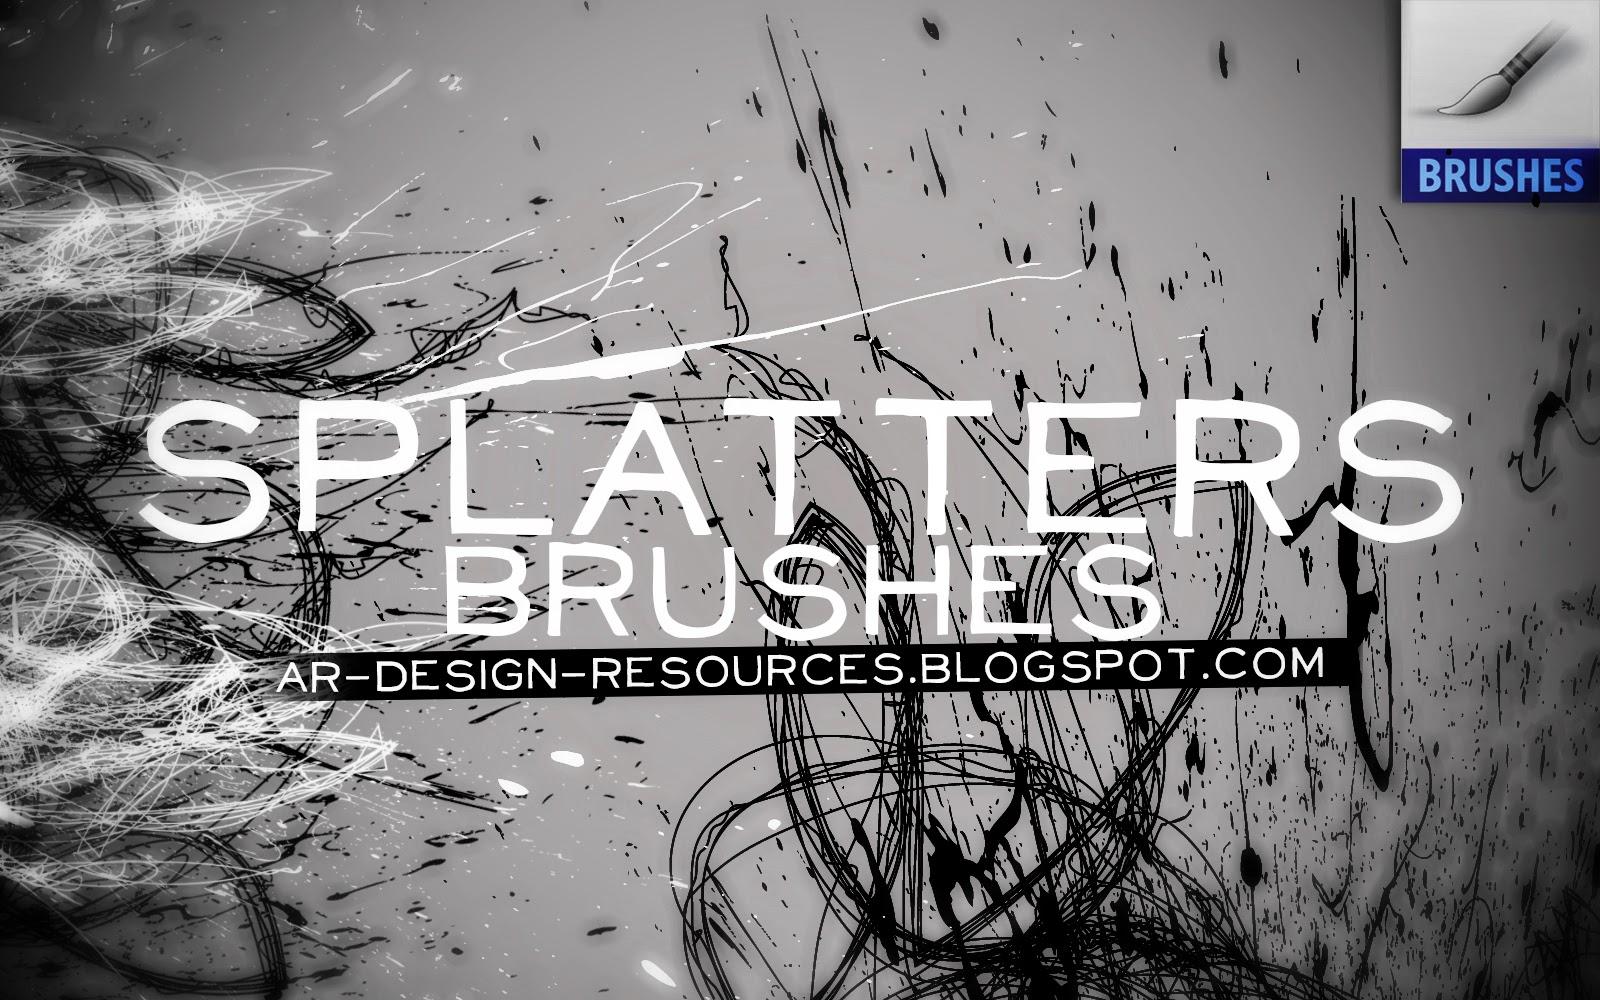 http://4.bp.blogspot.com/-iV127GJ_HkM/U6jcjT3YOAI/AAAAAAAAAw0/bWkpfVtmdTw/s1600/Splatters_Brushes_Ar-Design-Resources.jpg